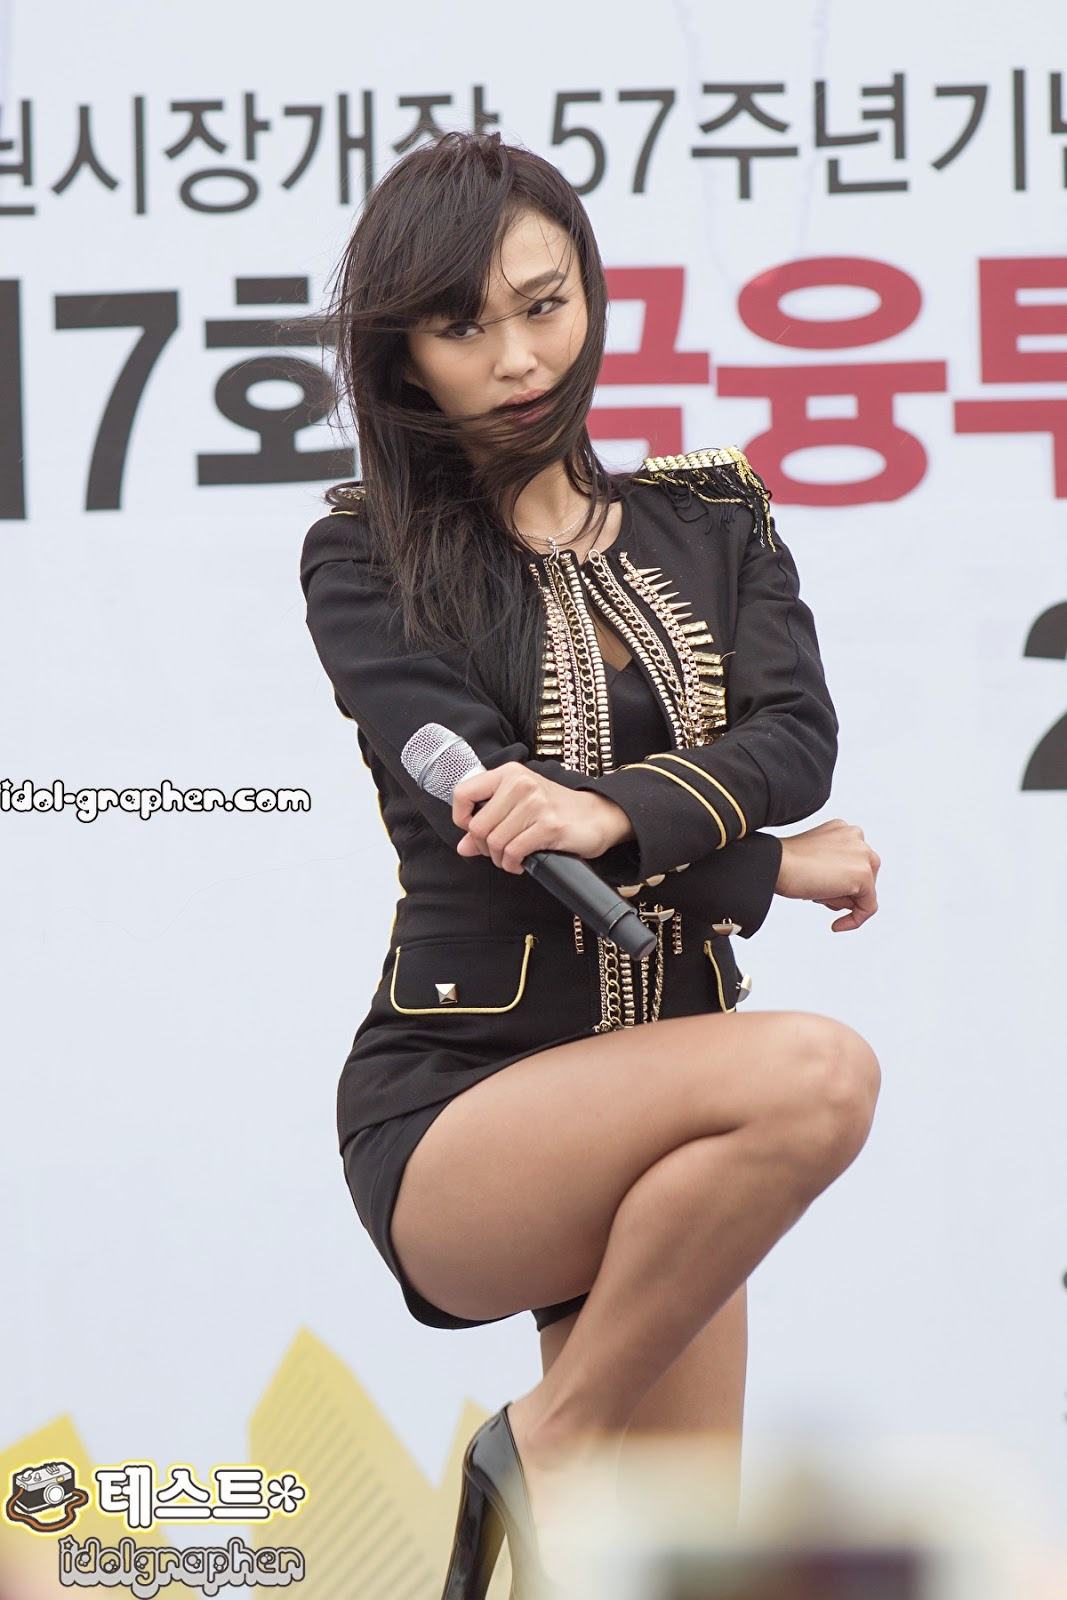 Sistar (씨스타) Hyorin (효린)- Bulls Race on 06 April 2013